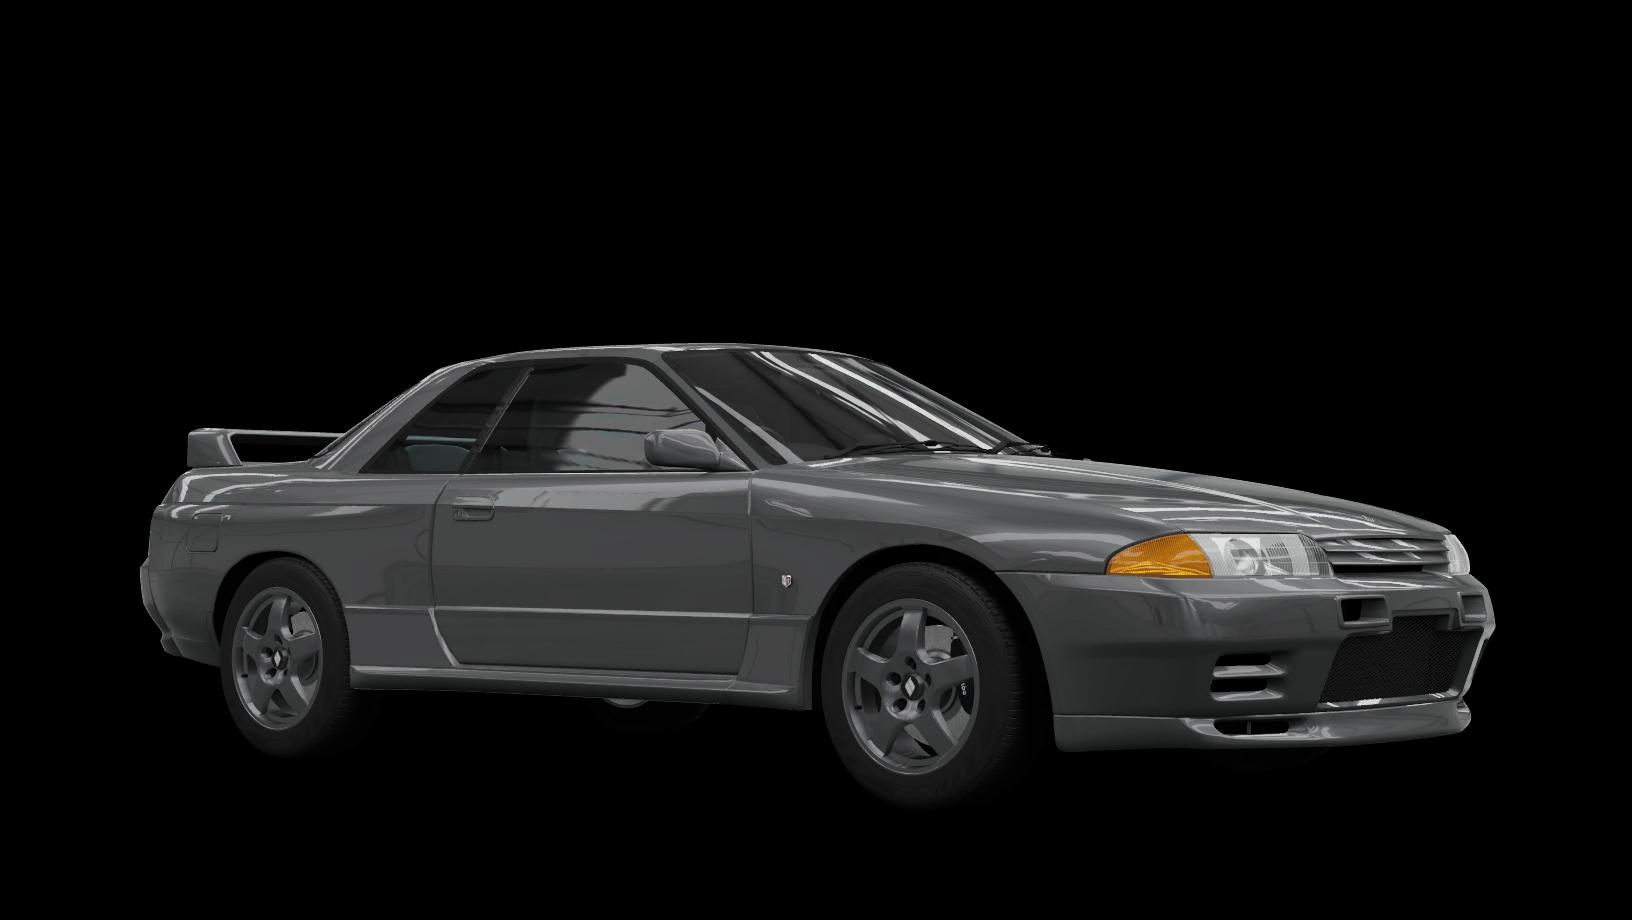 Nissan Skyline GT-R V-Spec (1993)